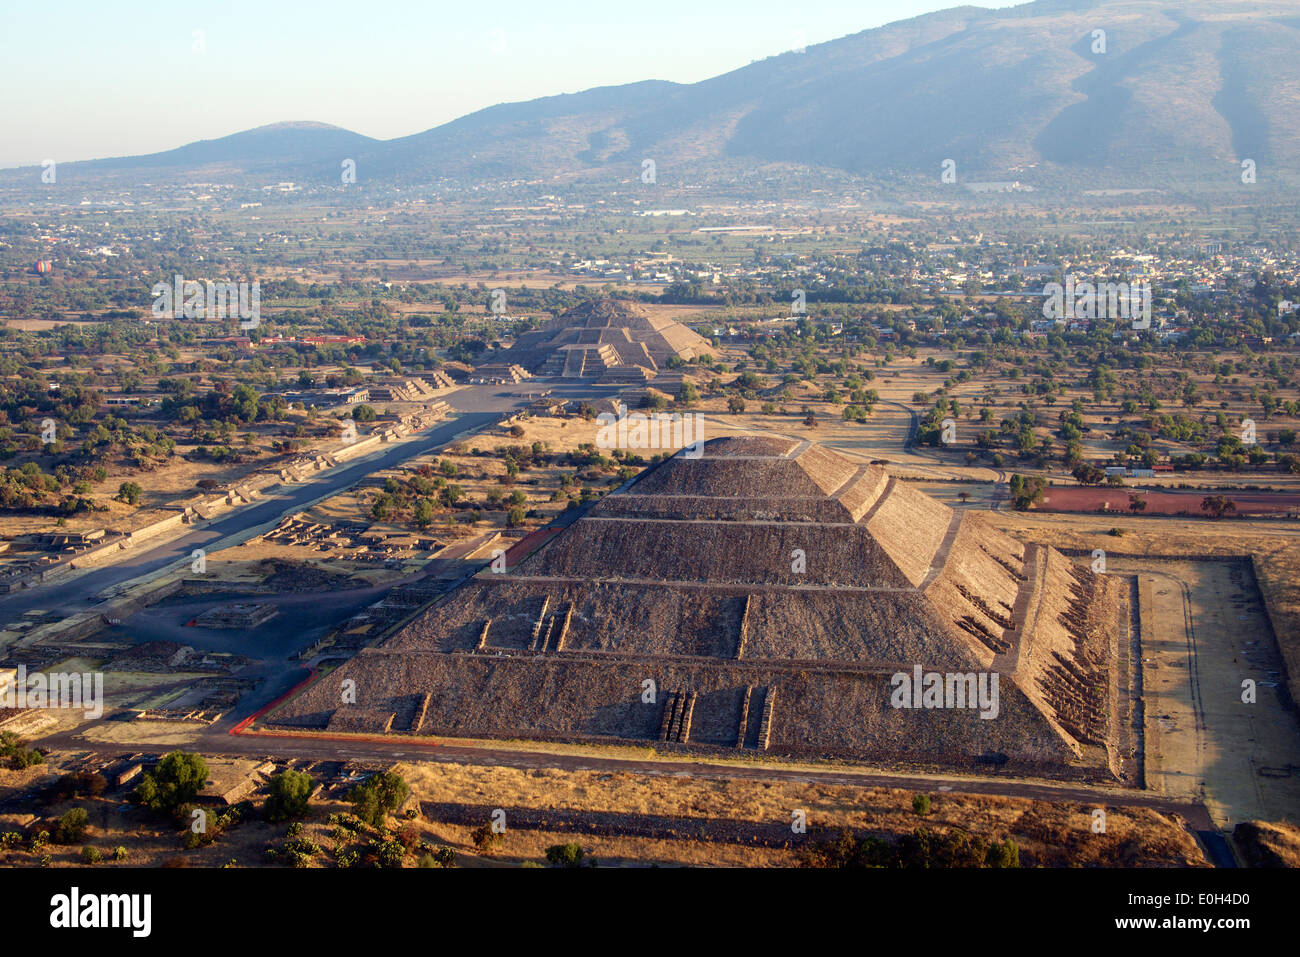 Pyramid Of The Sun Aerial View Stock Photos & Pyramid Of ...